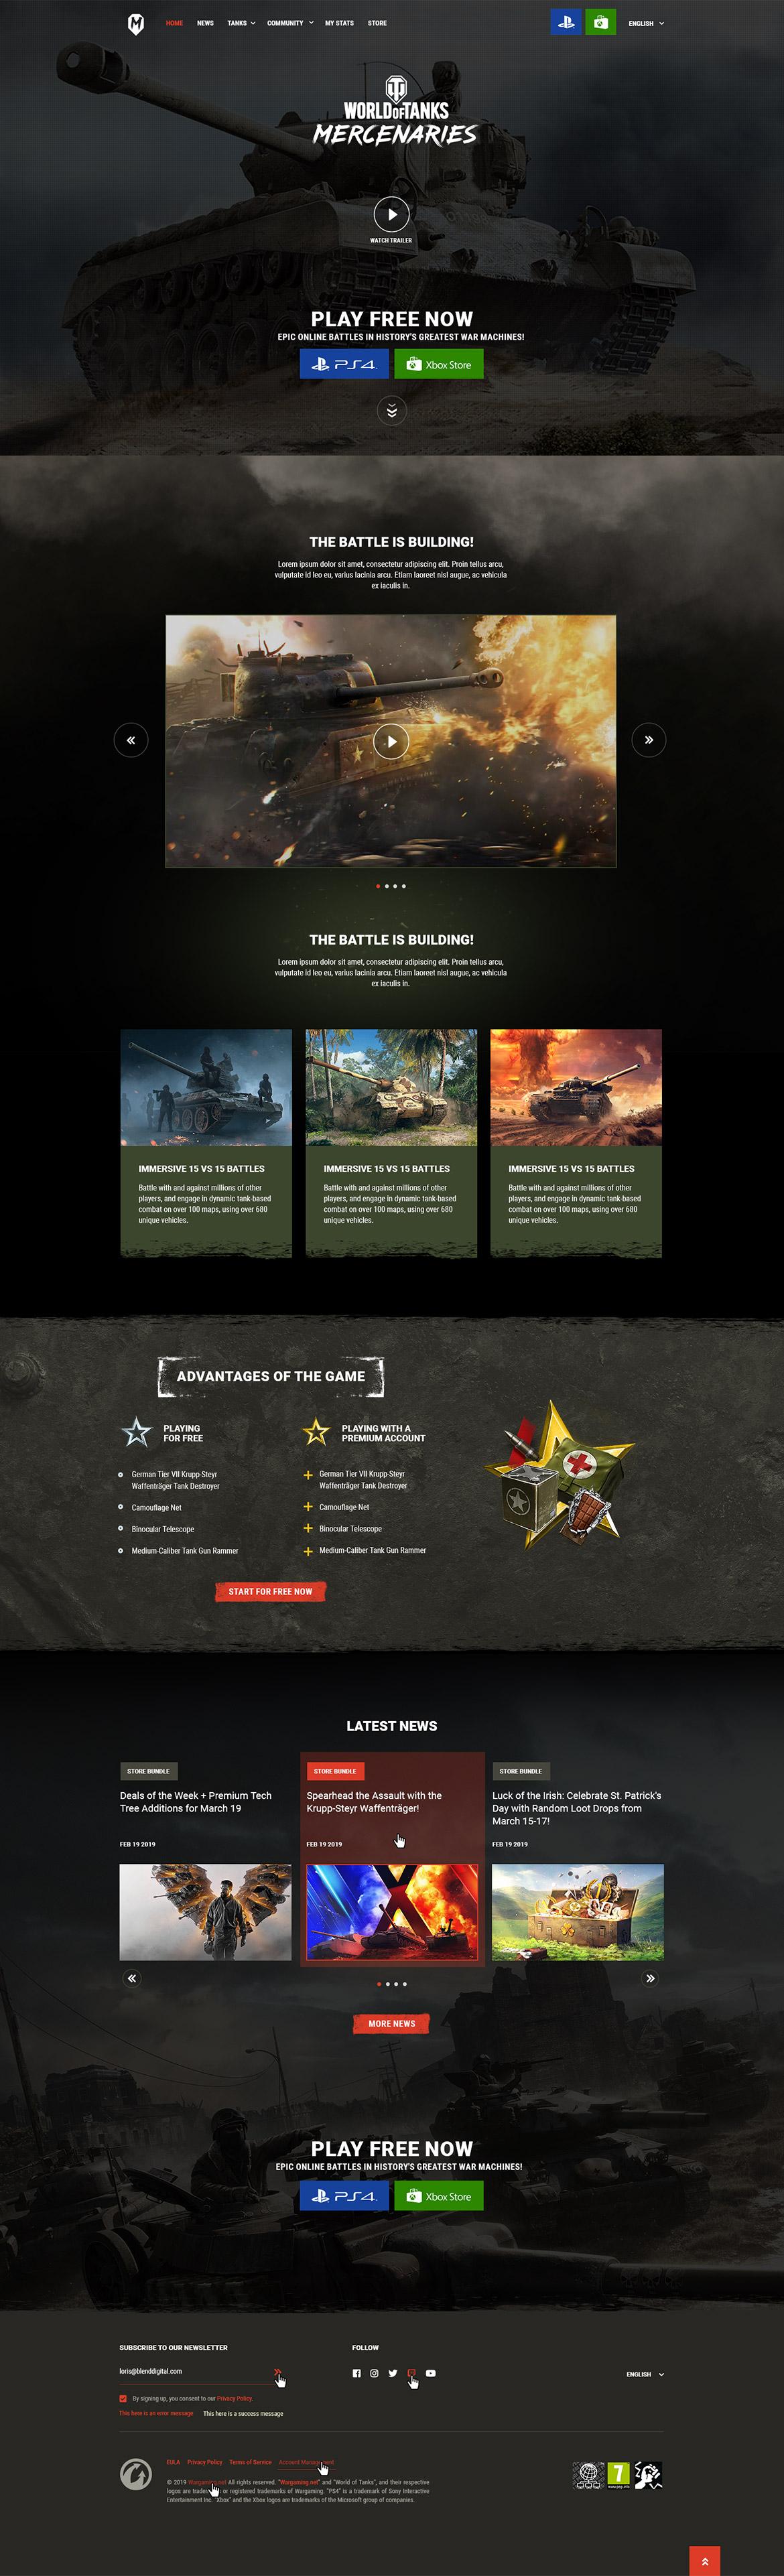 wotmerc-website03